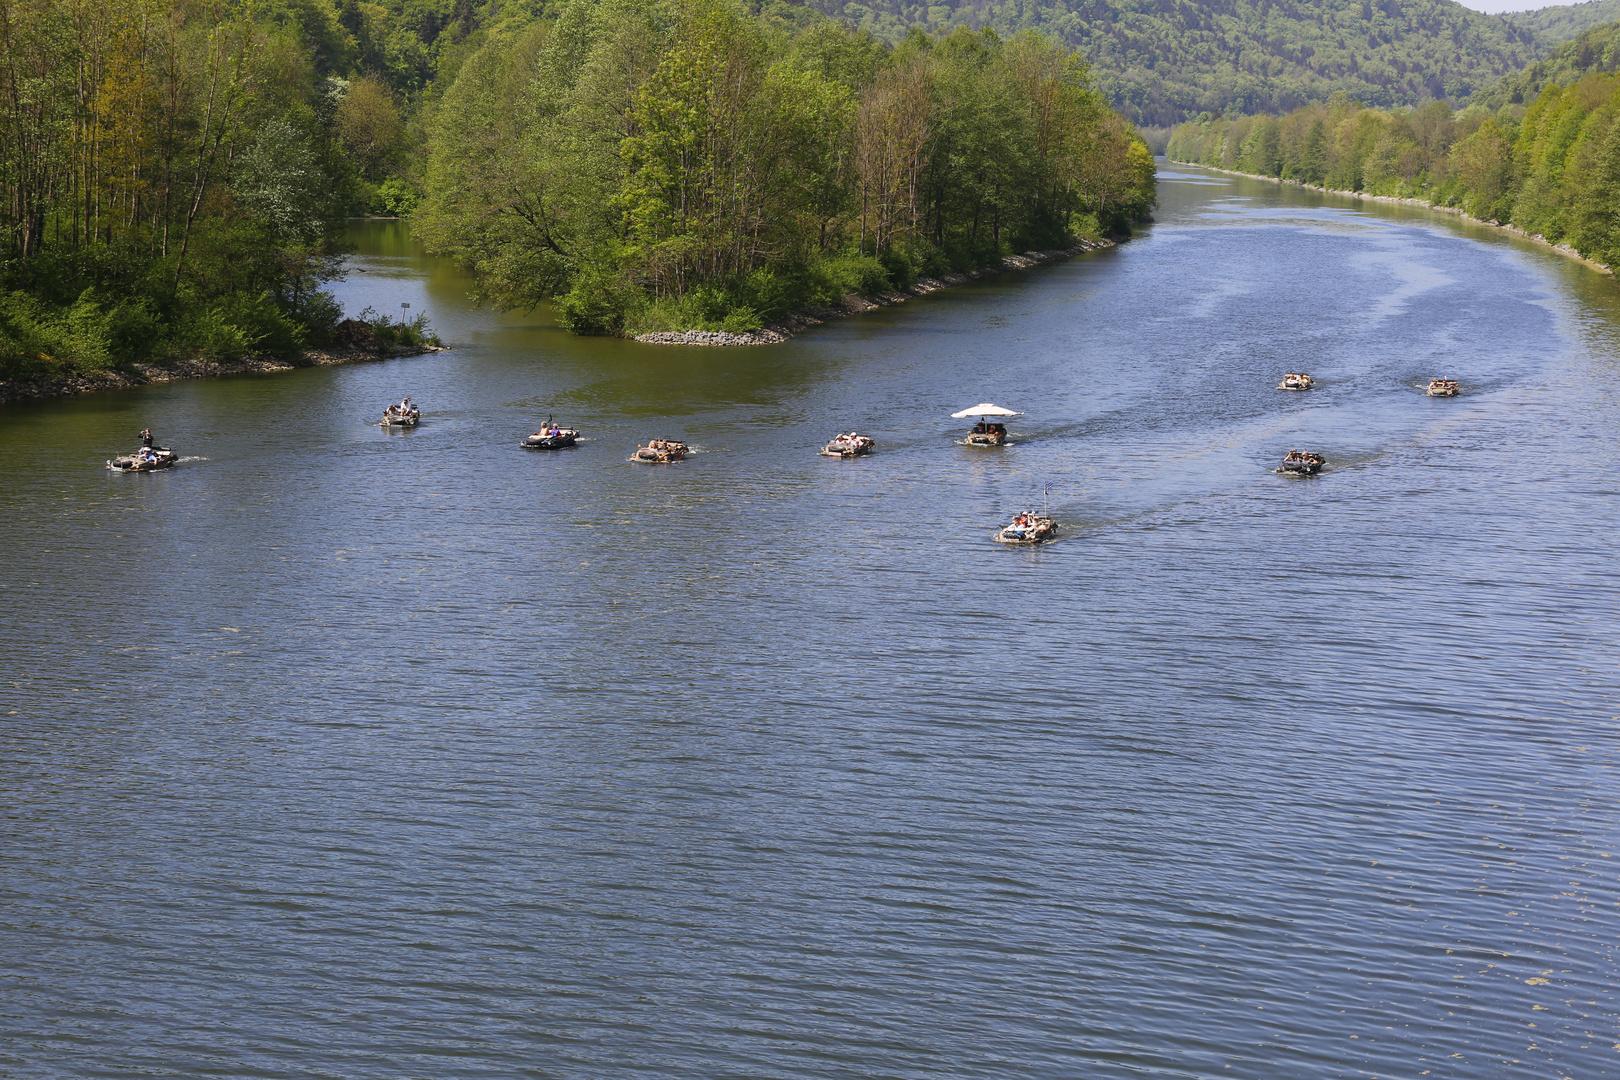 Familienausflug der Amphibienfahrzeuge am RMD-Kanal